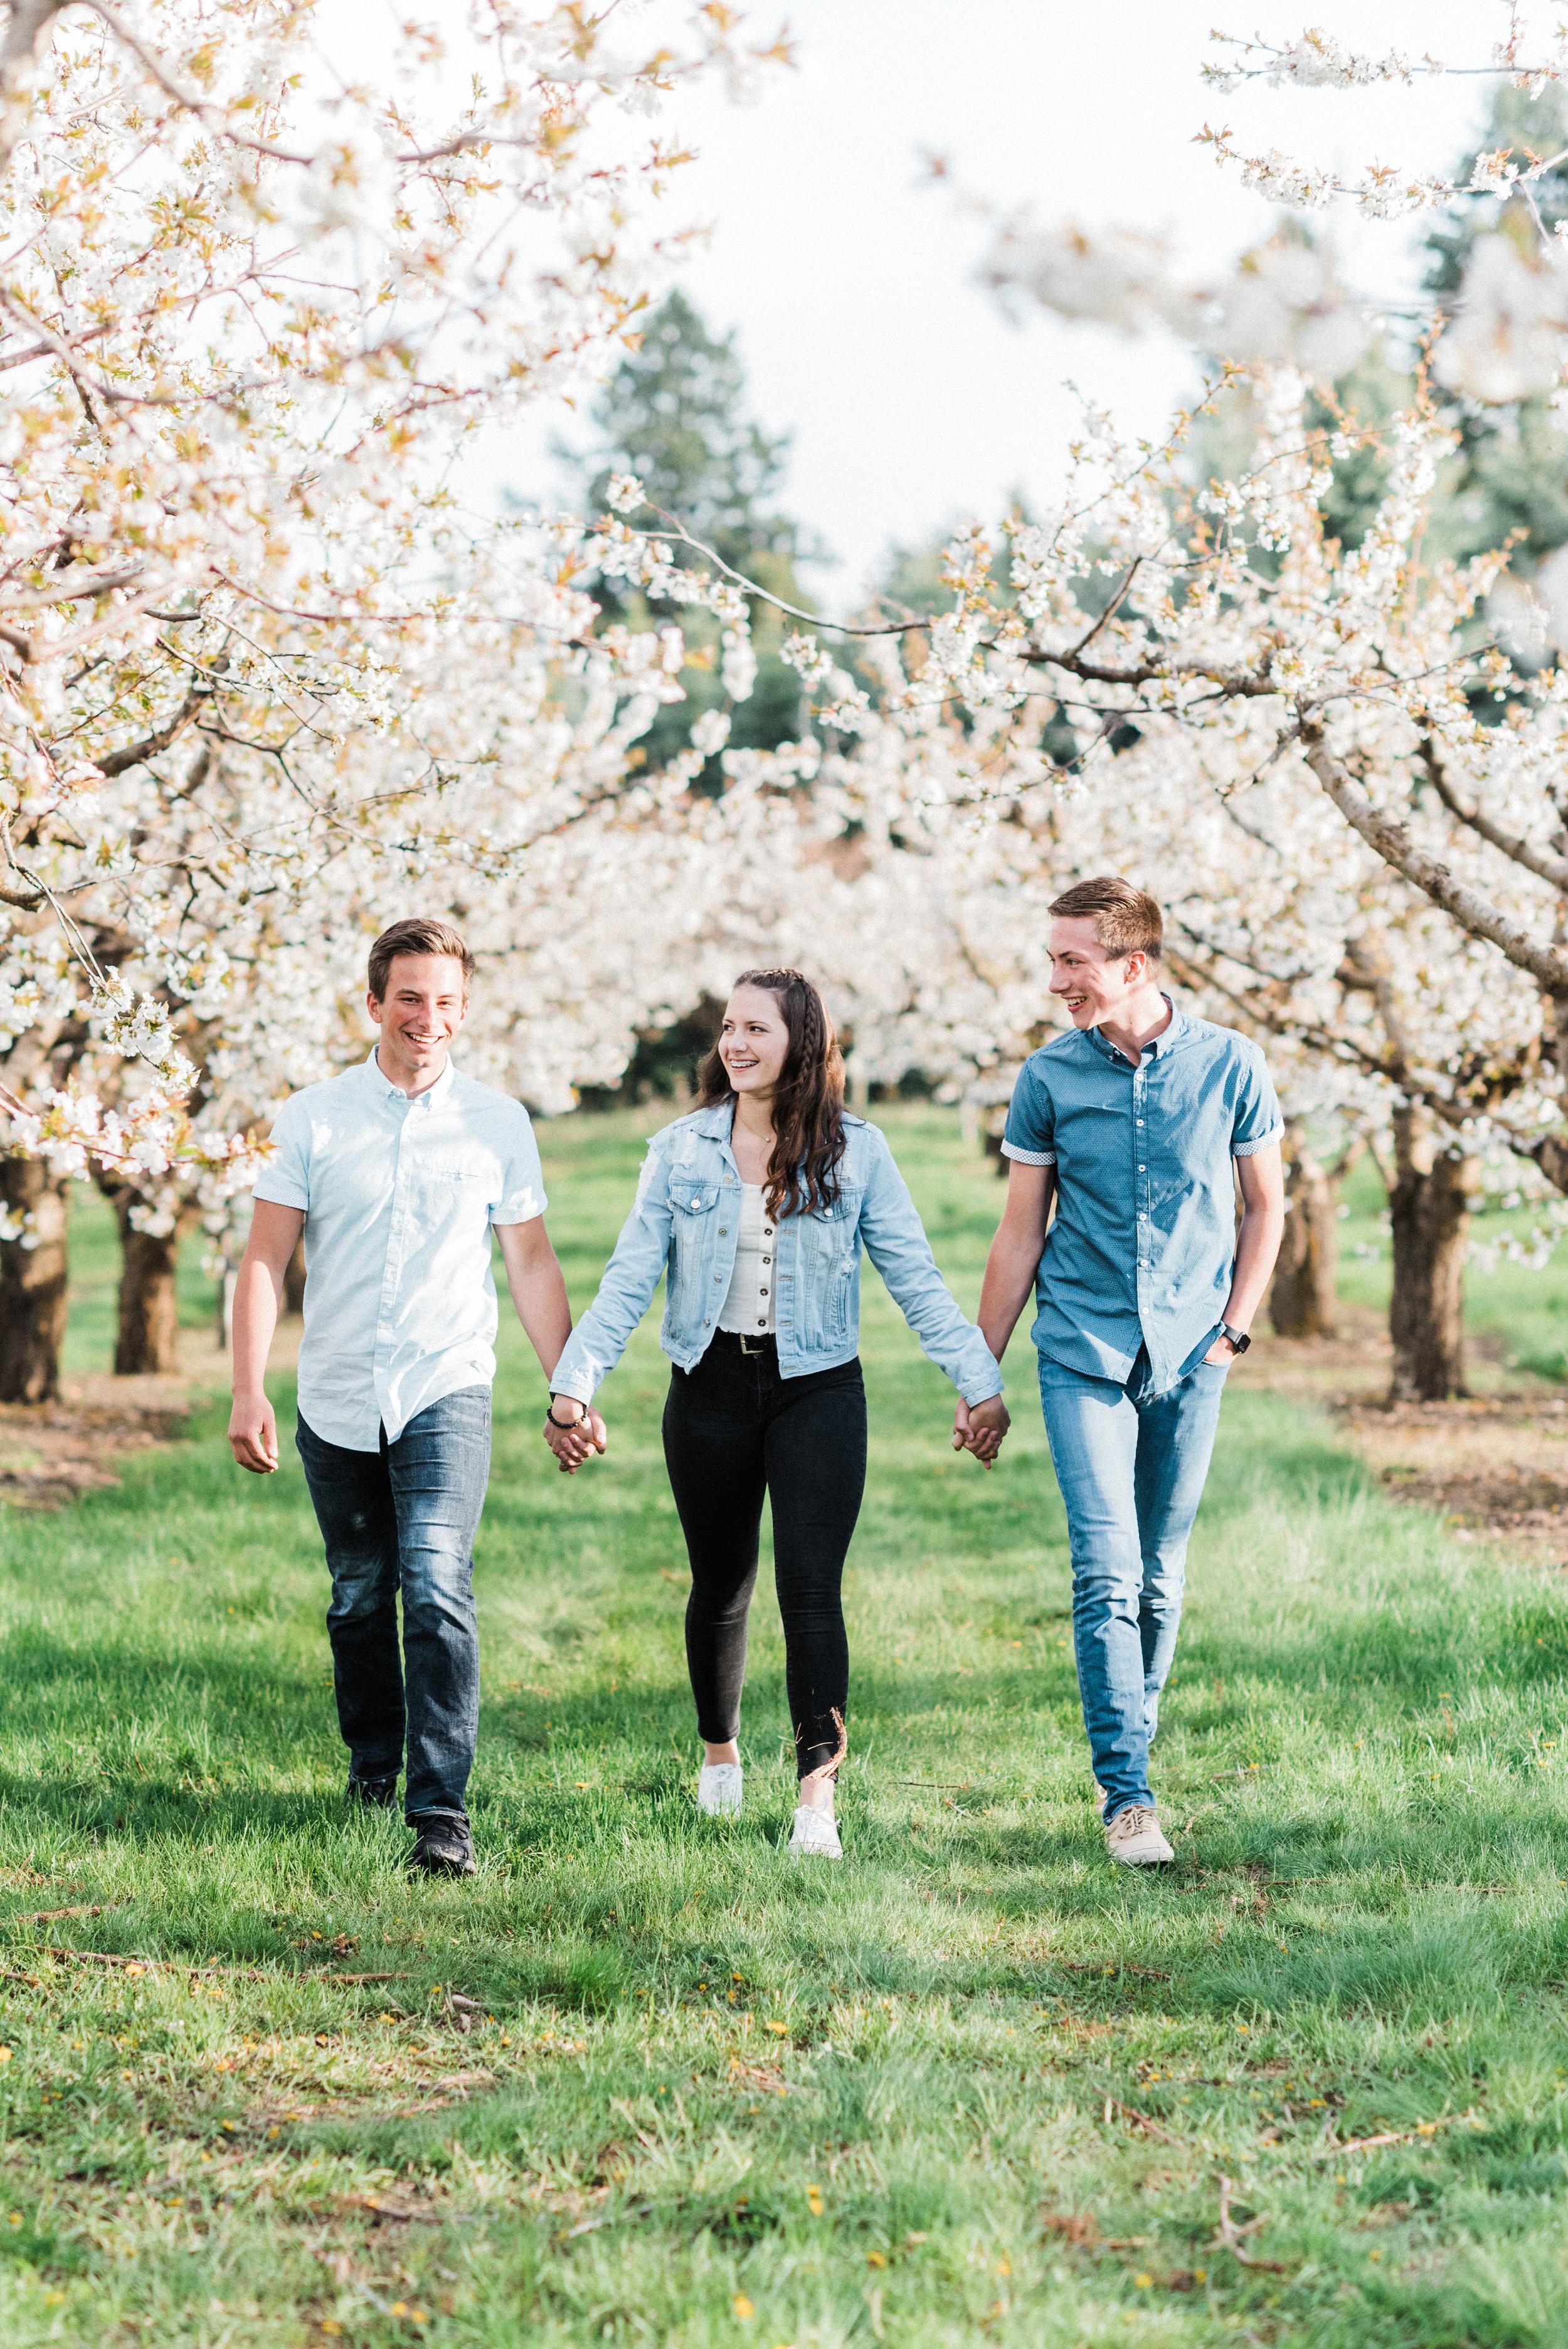 orchard_family_session_spokane_wa-5.jpg